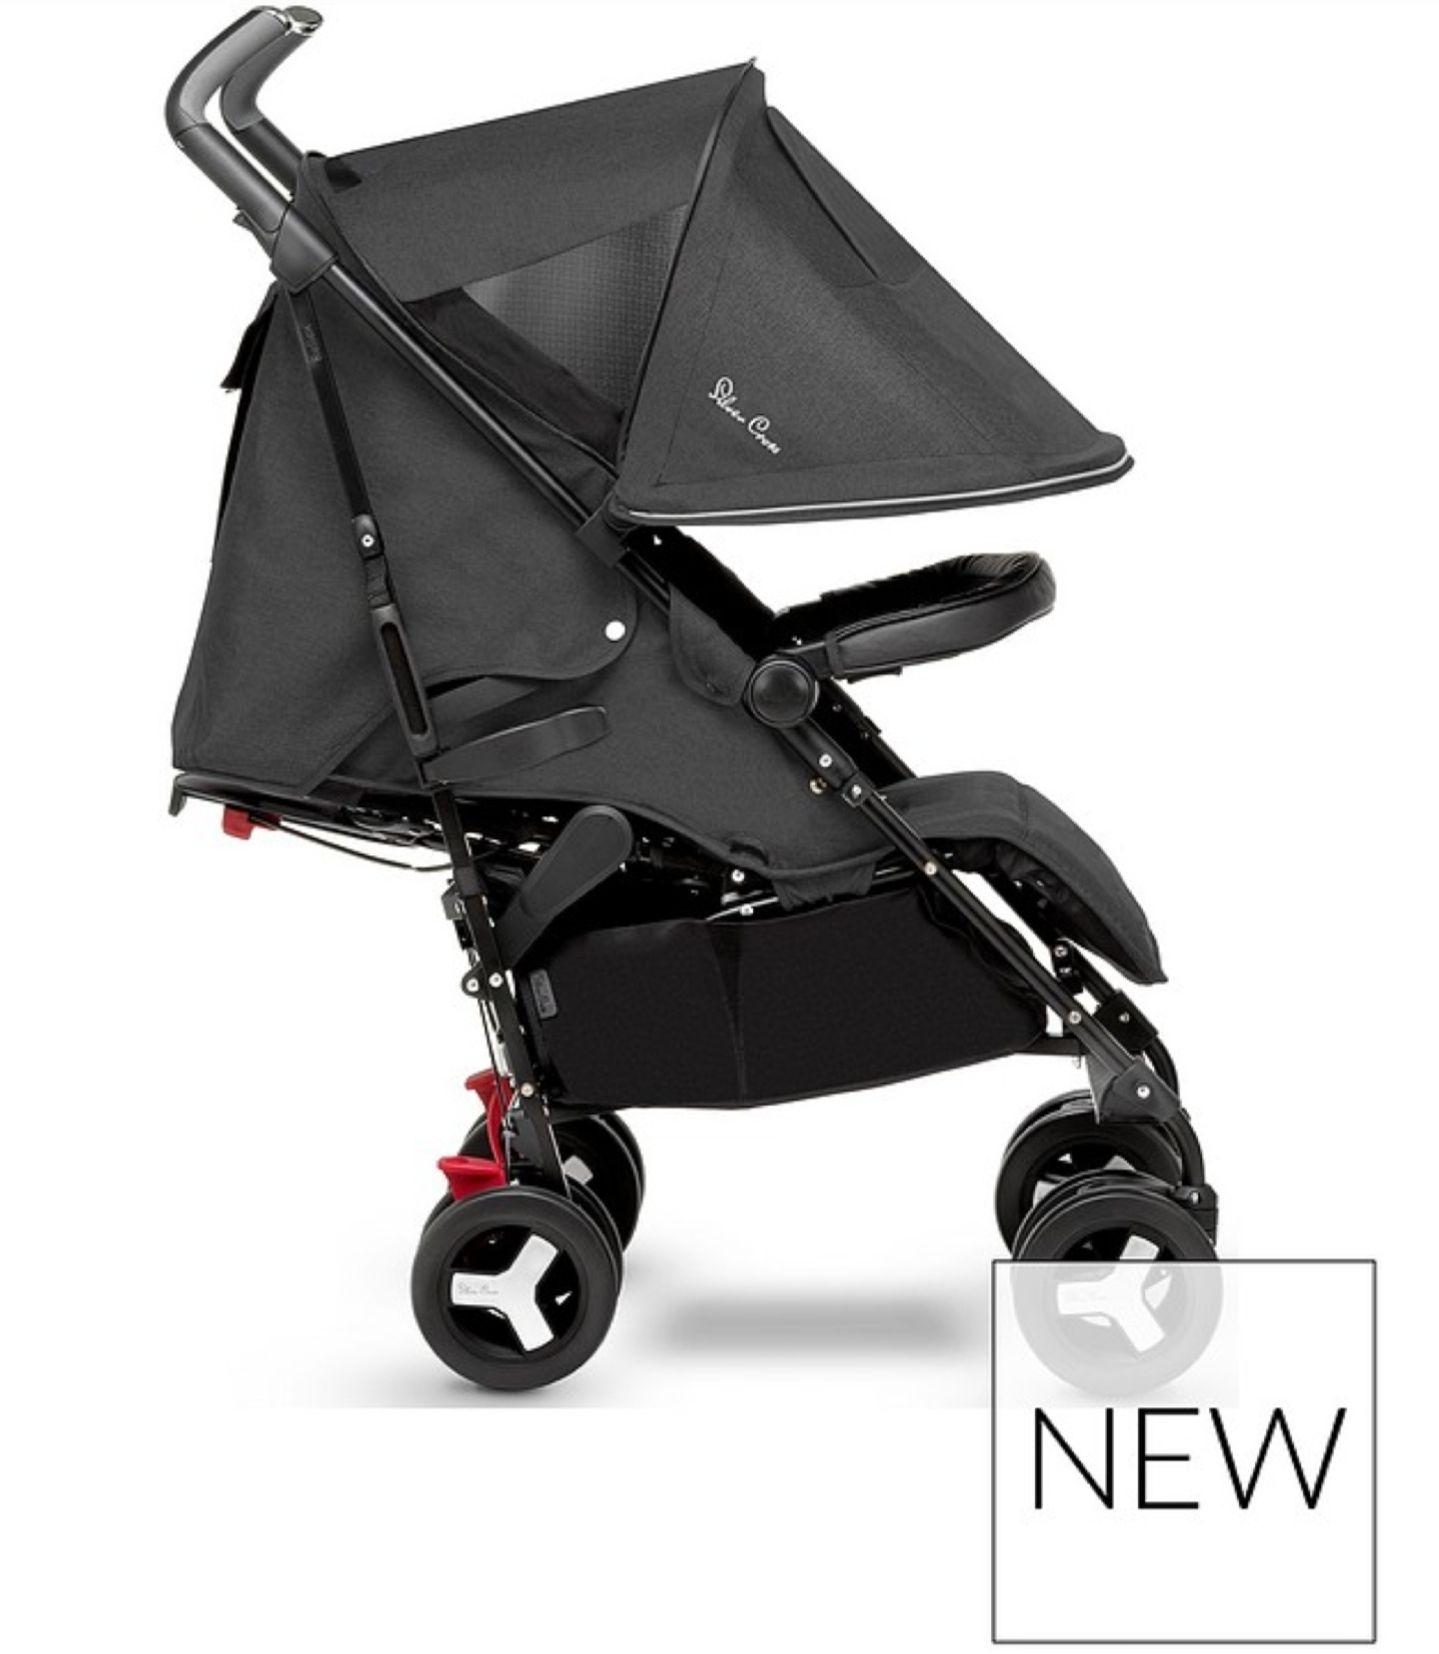 Silver Cross Reflex Onyx Stroller £189.99 + £3.99 p&p @ Very